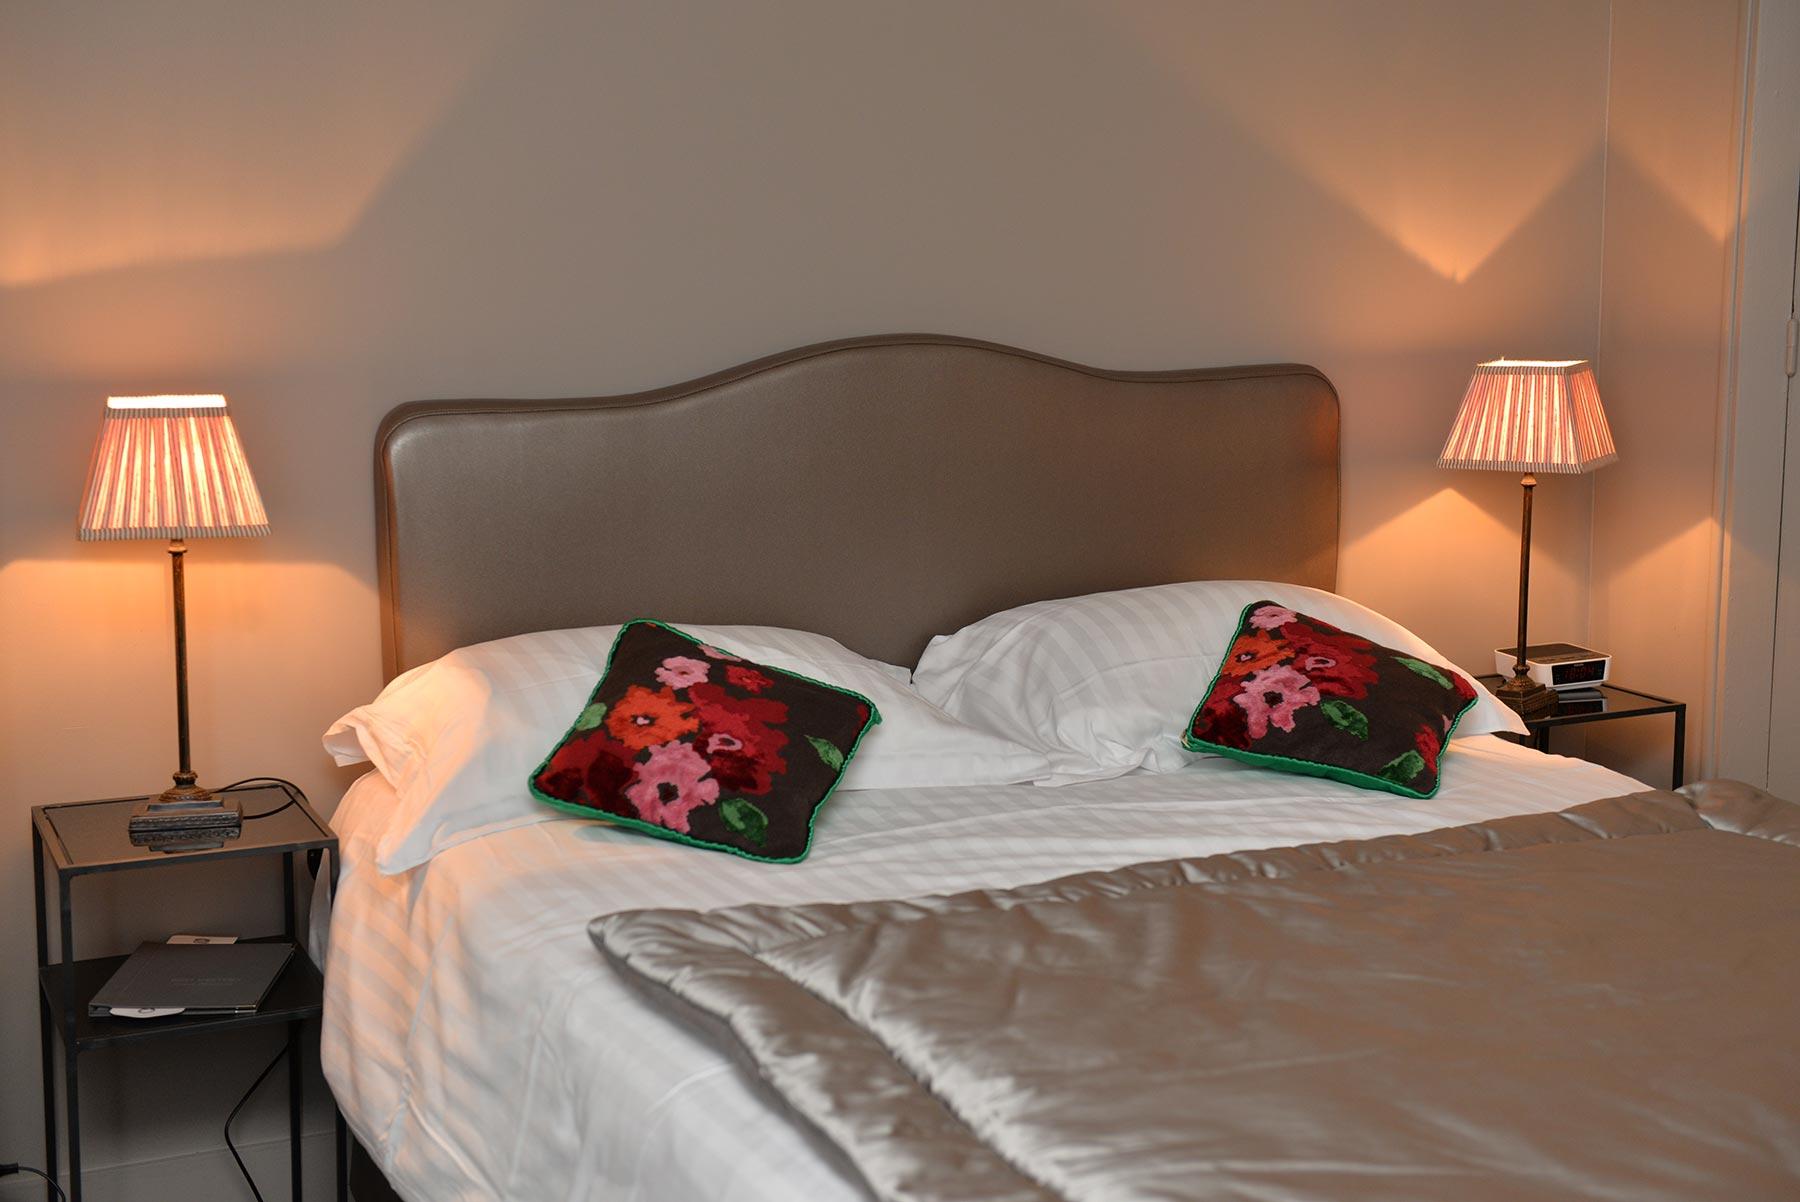 hotel d 39 europe et d 39 angleterre m con bourgogne du sud la chambre standard h tel d 39 europe. Black Bedroom Furniture Sets. Home Design Ideas